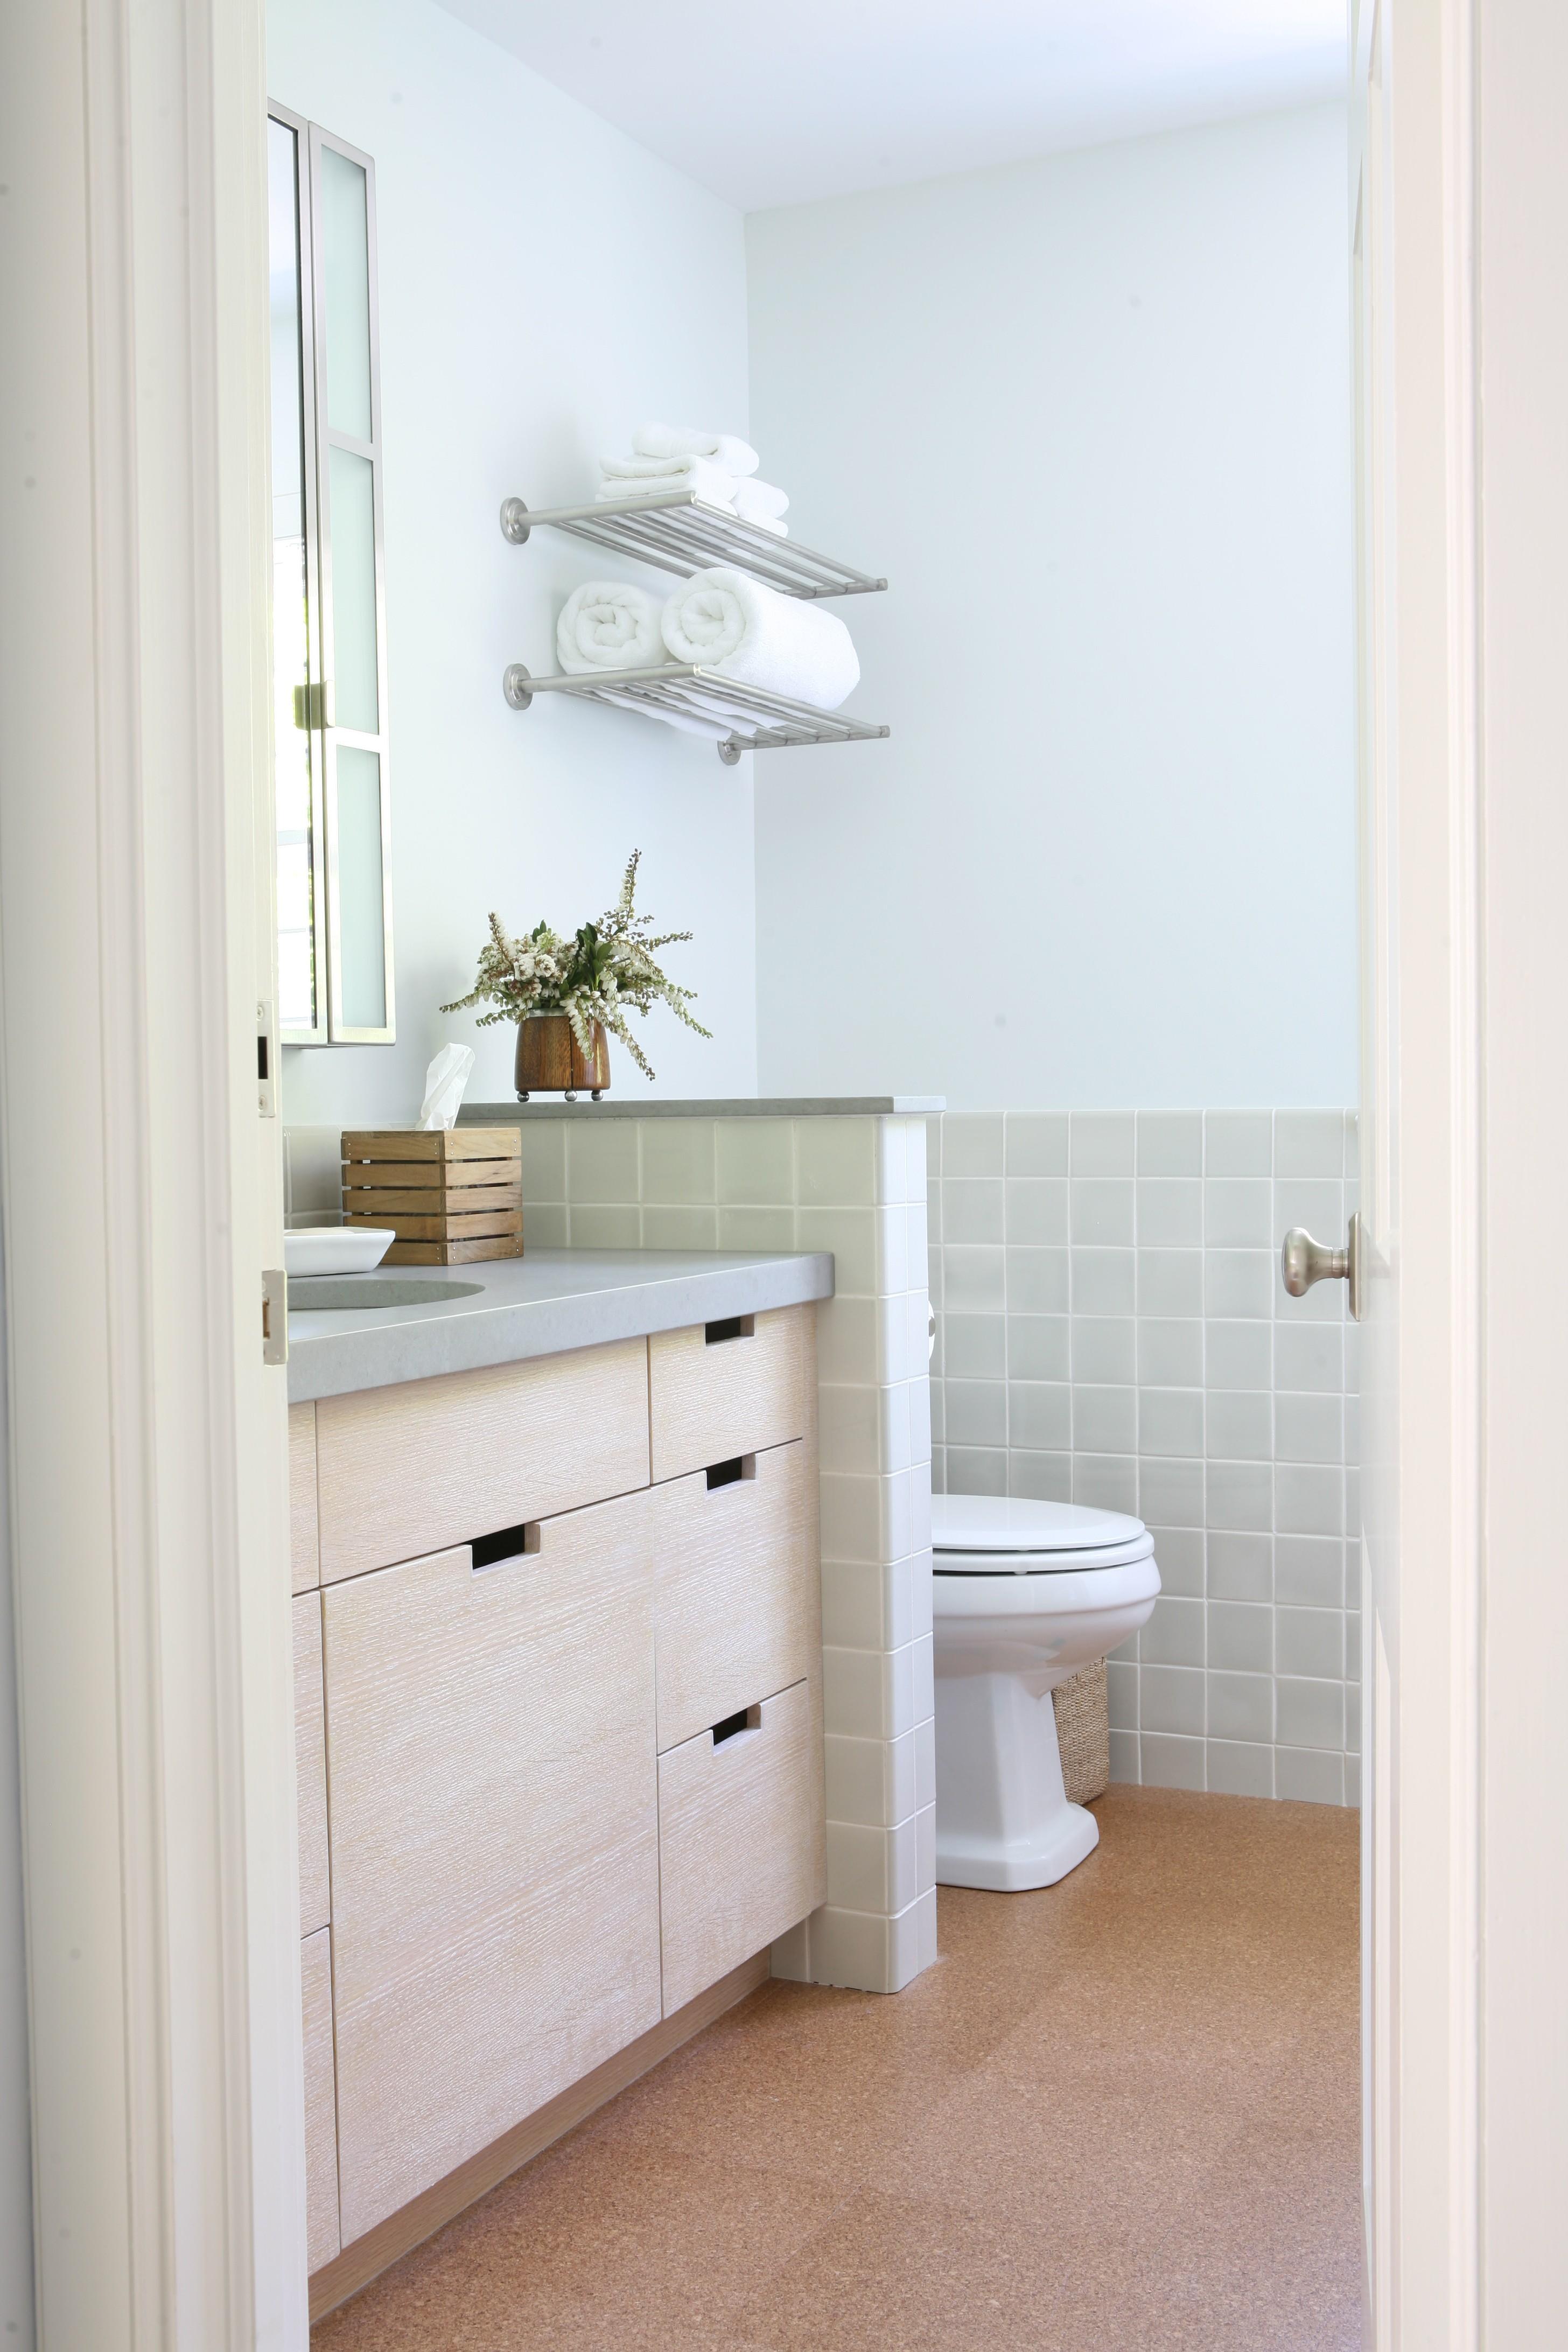 Easy clean bathroom - Foley Cox Interiors Bathroom Organization